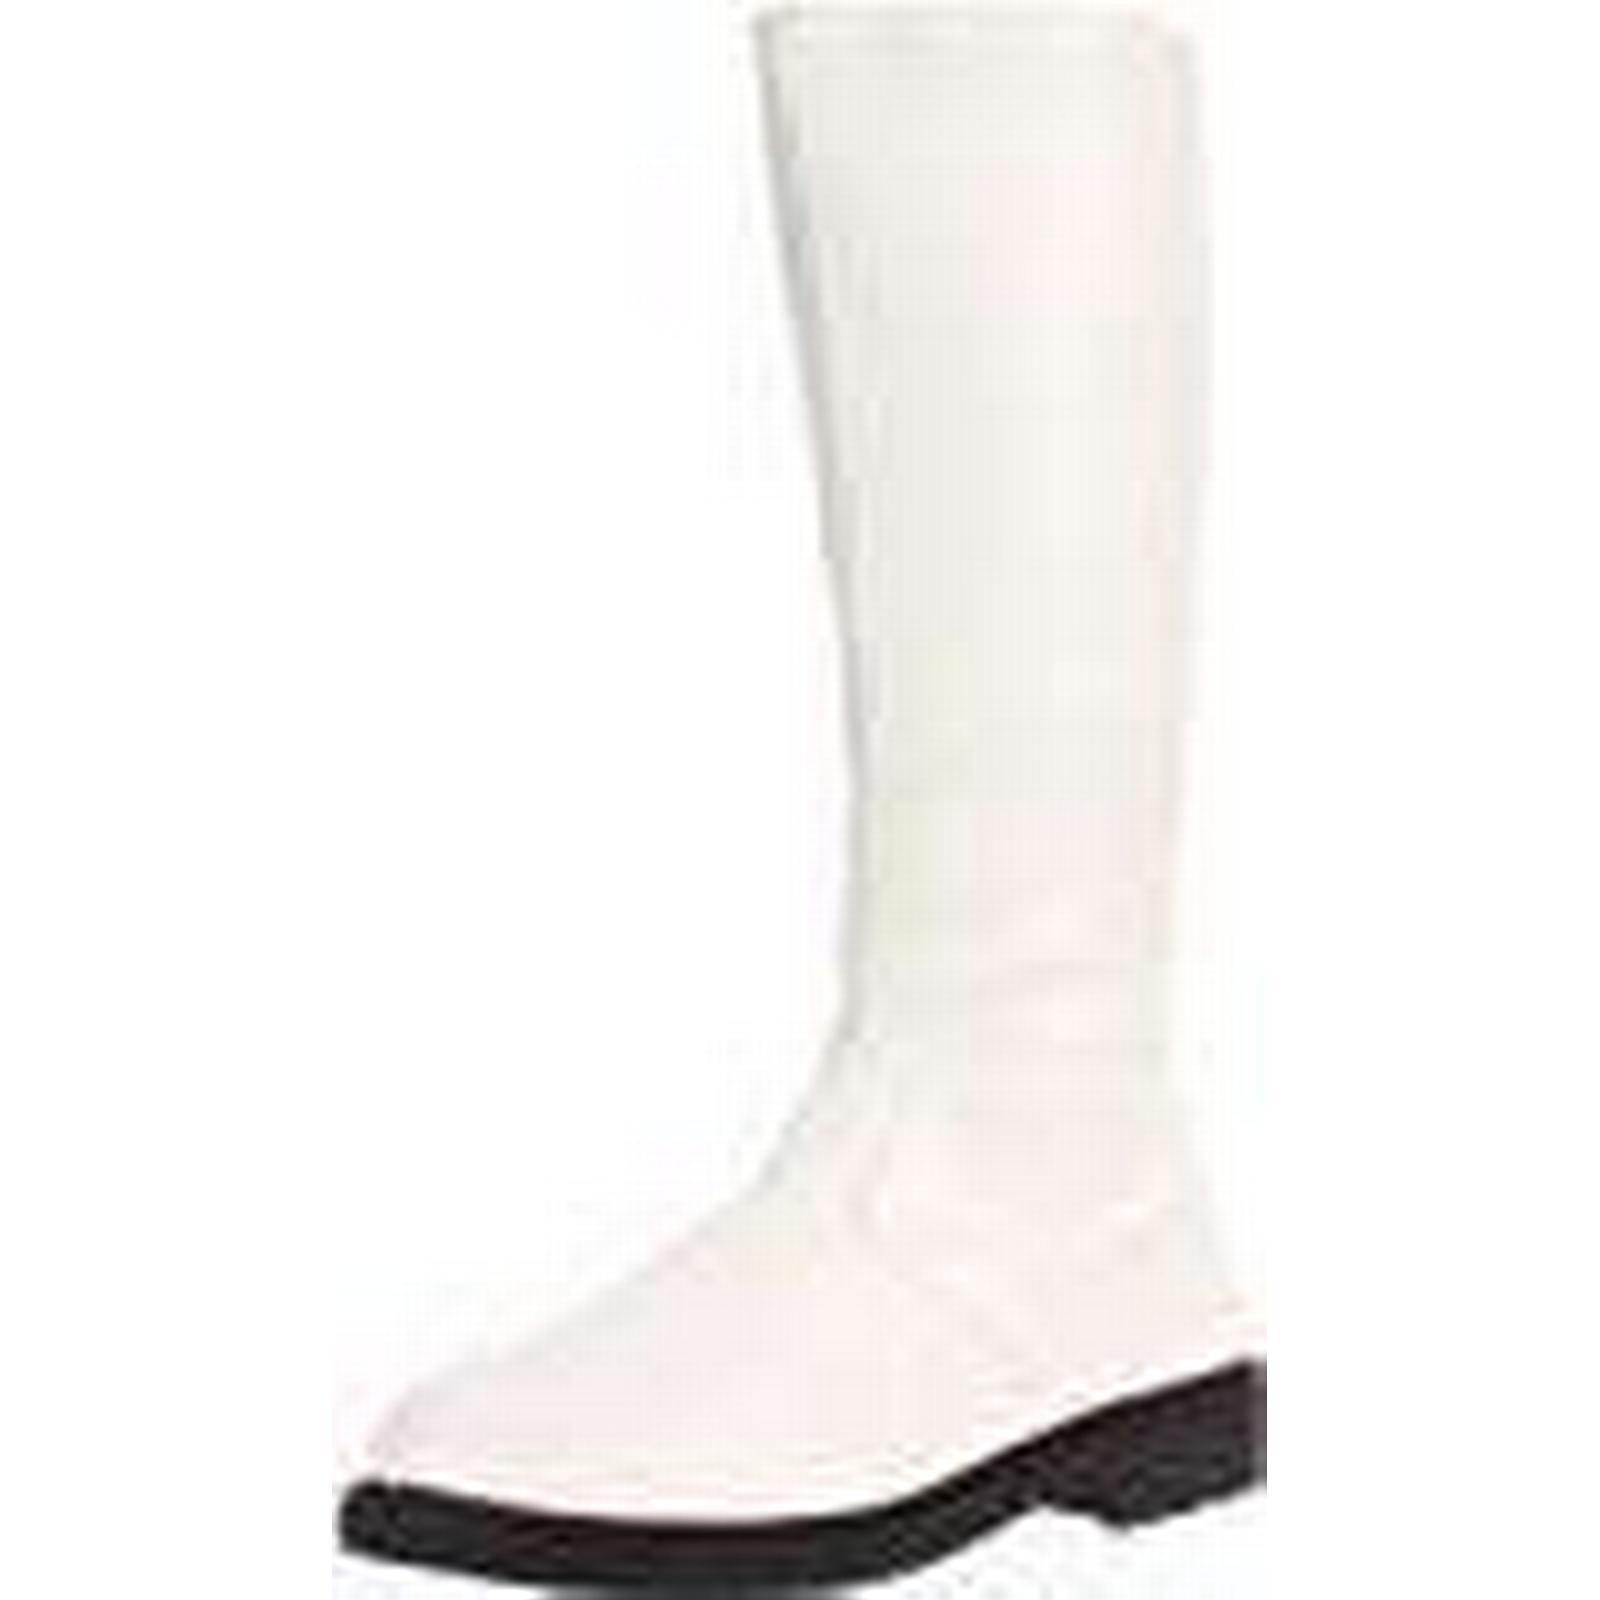 Funtasma Men''s Captain-100 Boots, White EU (Wht Pu), L 44/45 EU White 212325